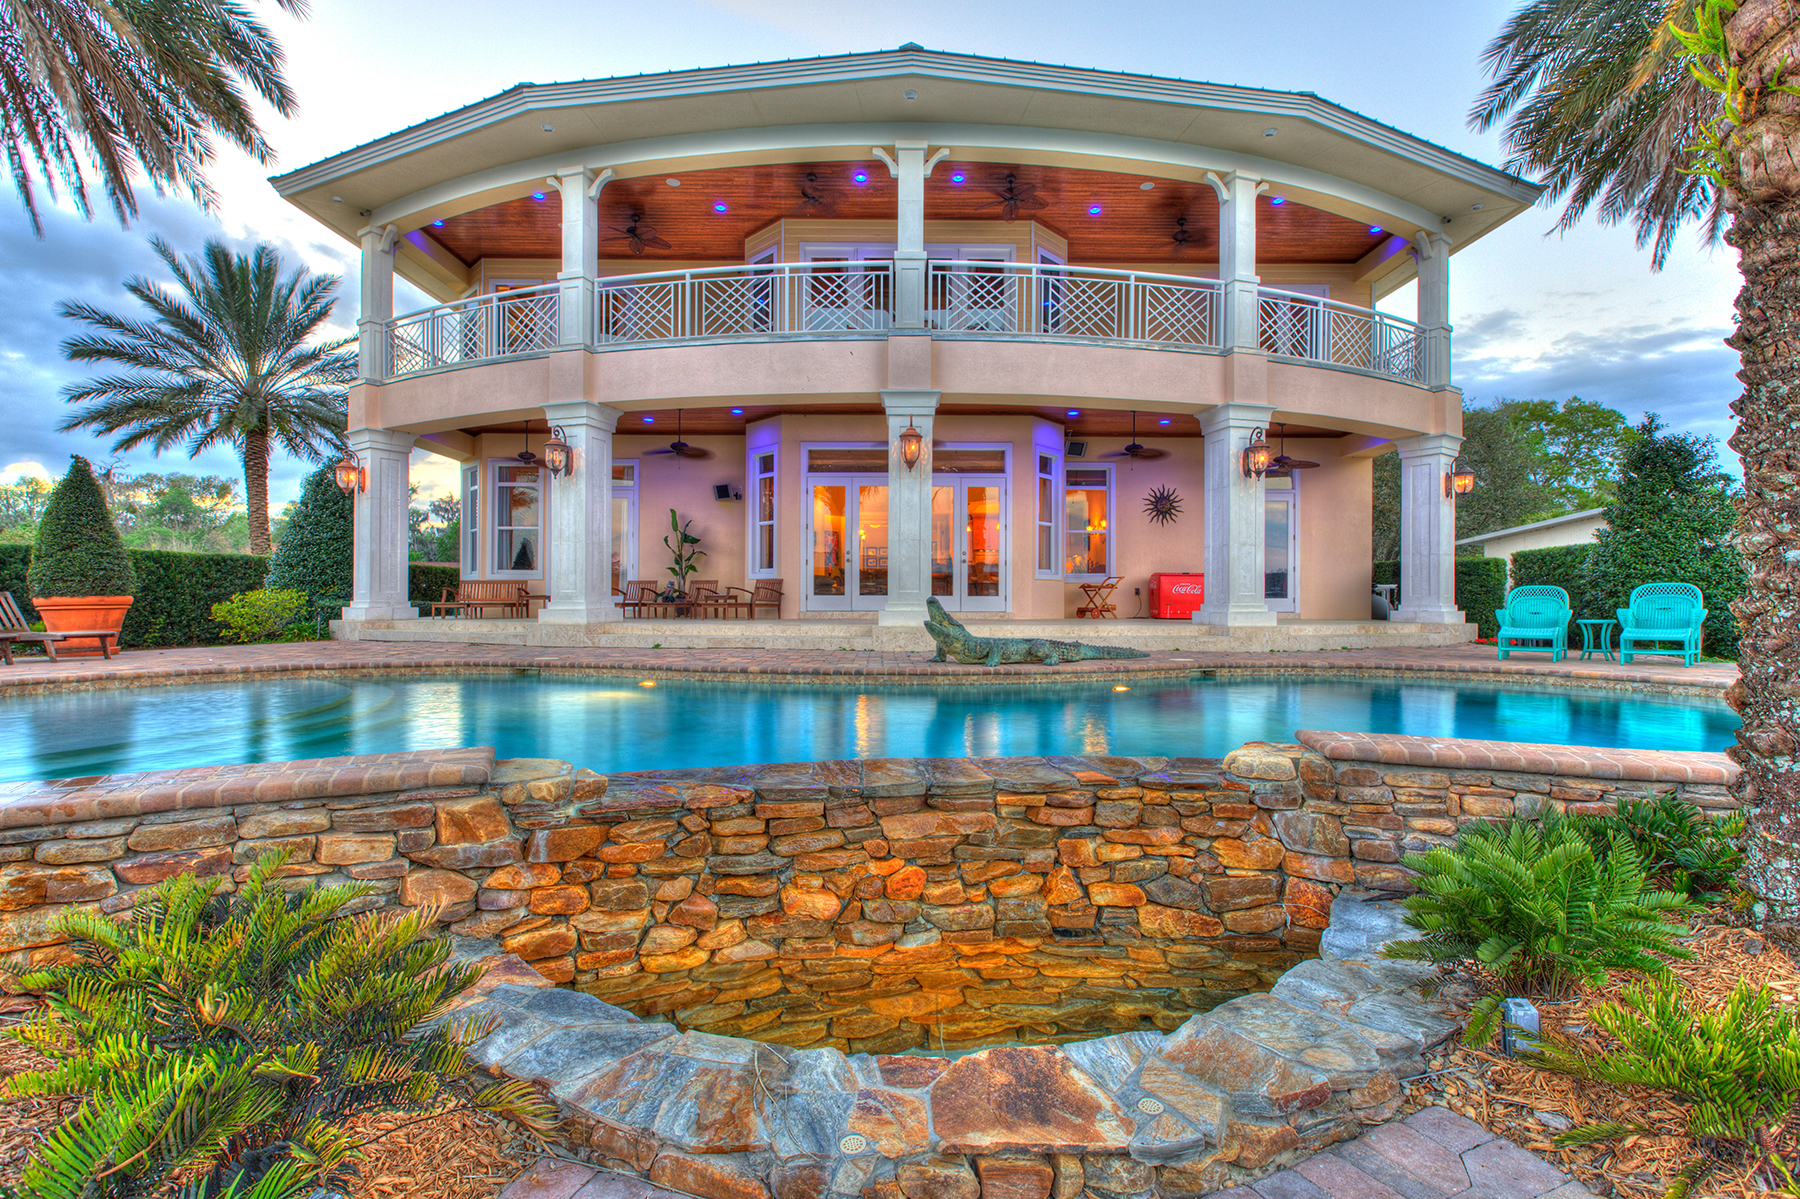 Single Family Home for Sale at ASTOR FLORIDA 56230 Redbud Rd Astor, Florida, 32102 United States